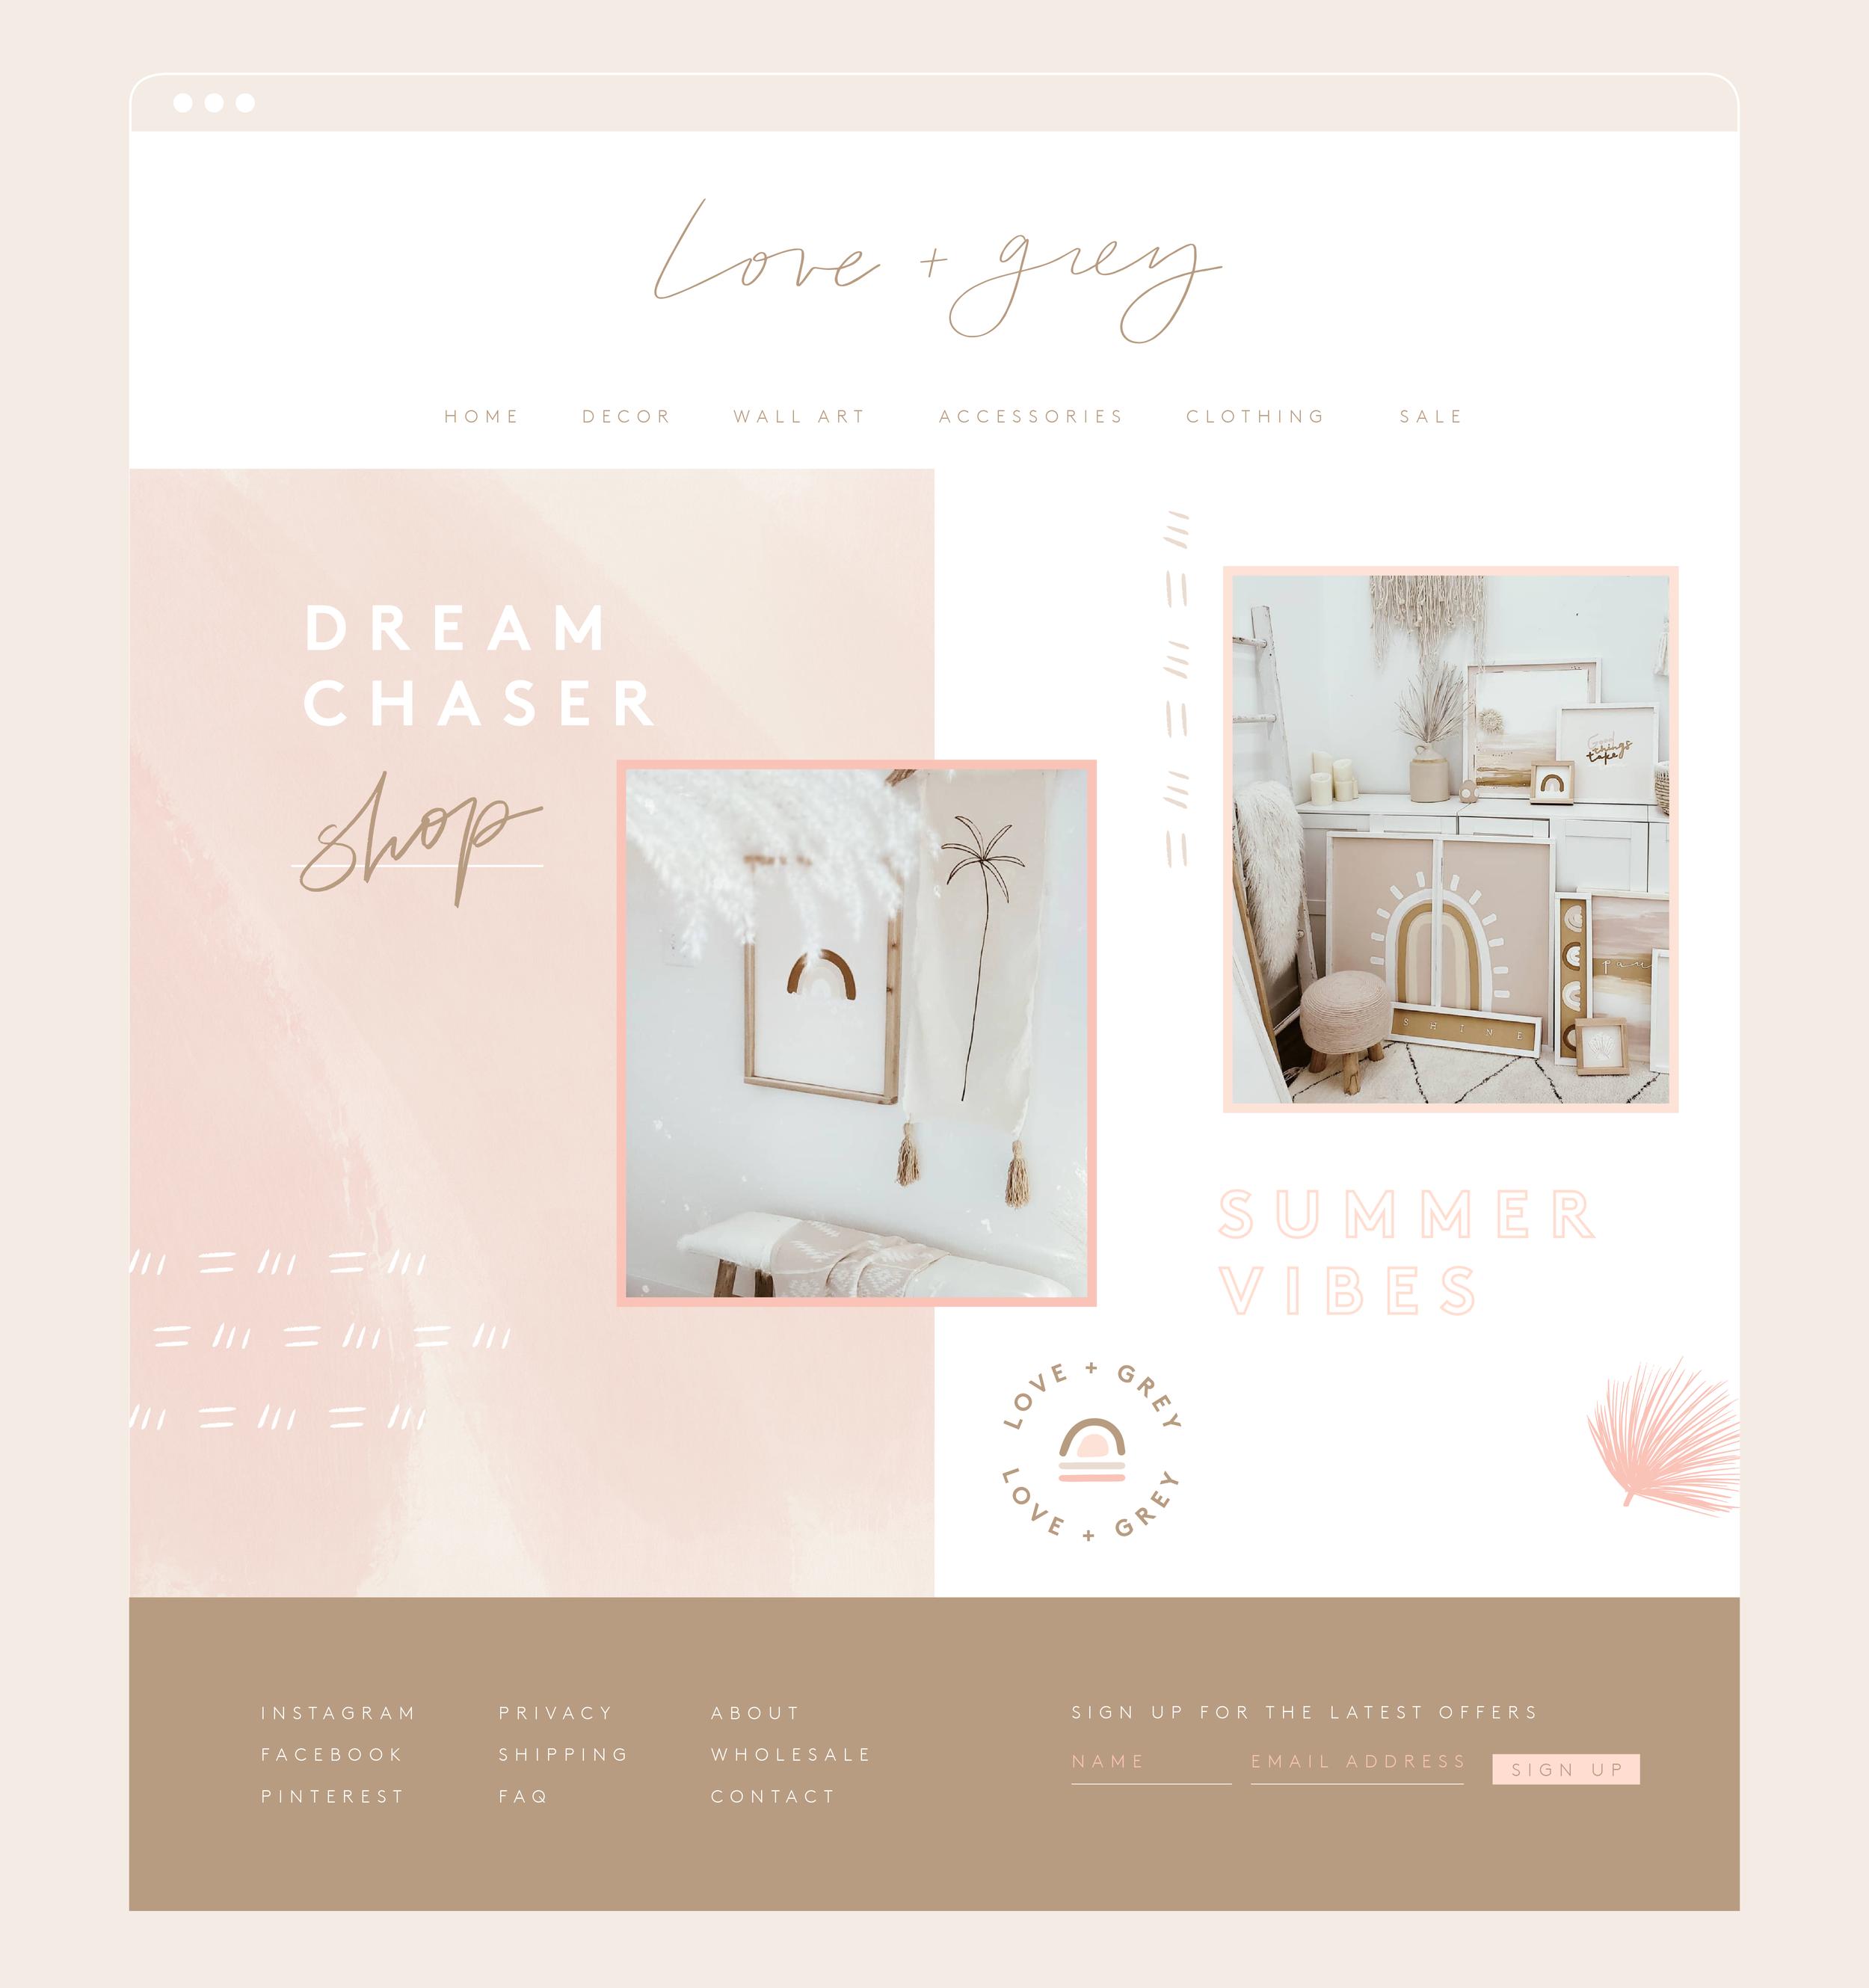 love-grey-etsy-wholesale-signs-branding-beachy-boho3.png